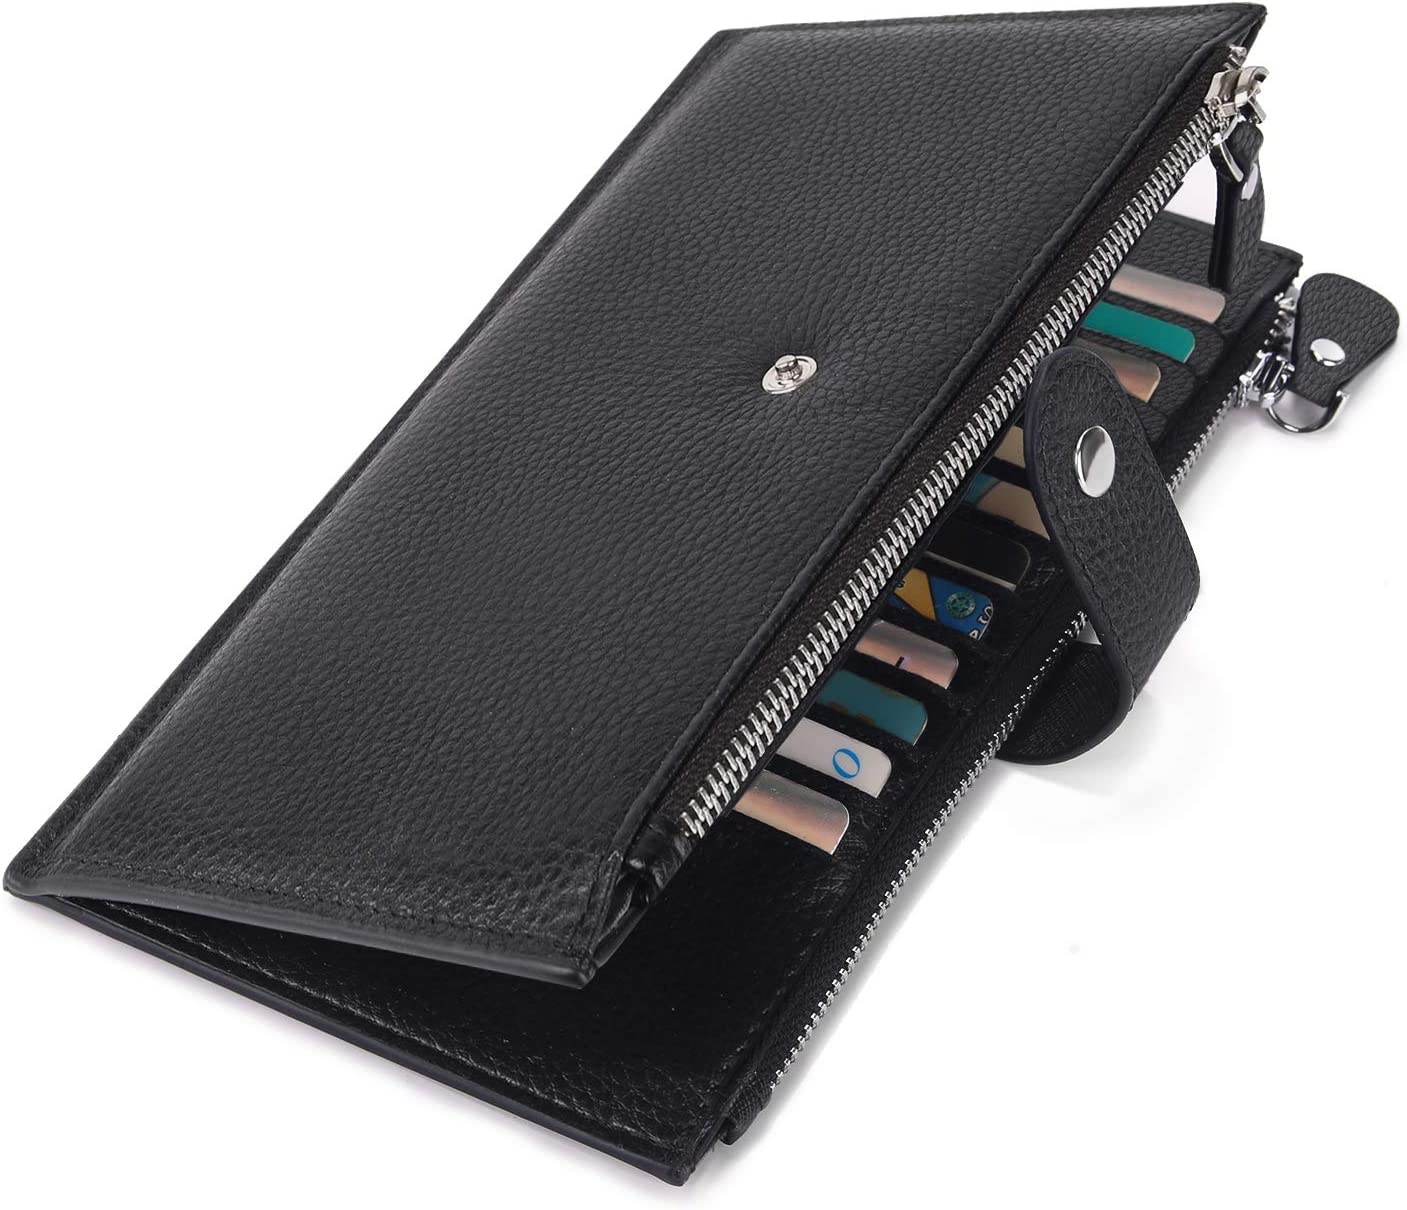 YALUXE Women-Wallet-Genuine-Leather-RFID Blocking Multi Slots Organizer with Zipper Pocket Credit Card Holder Bifold